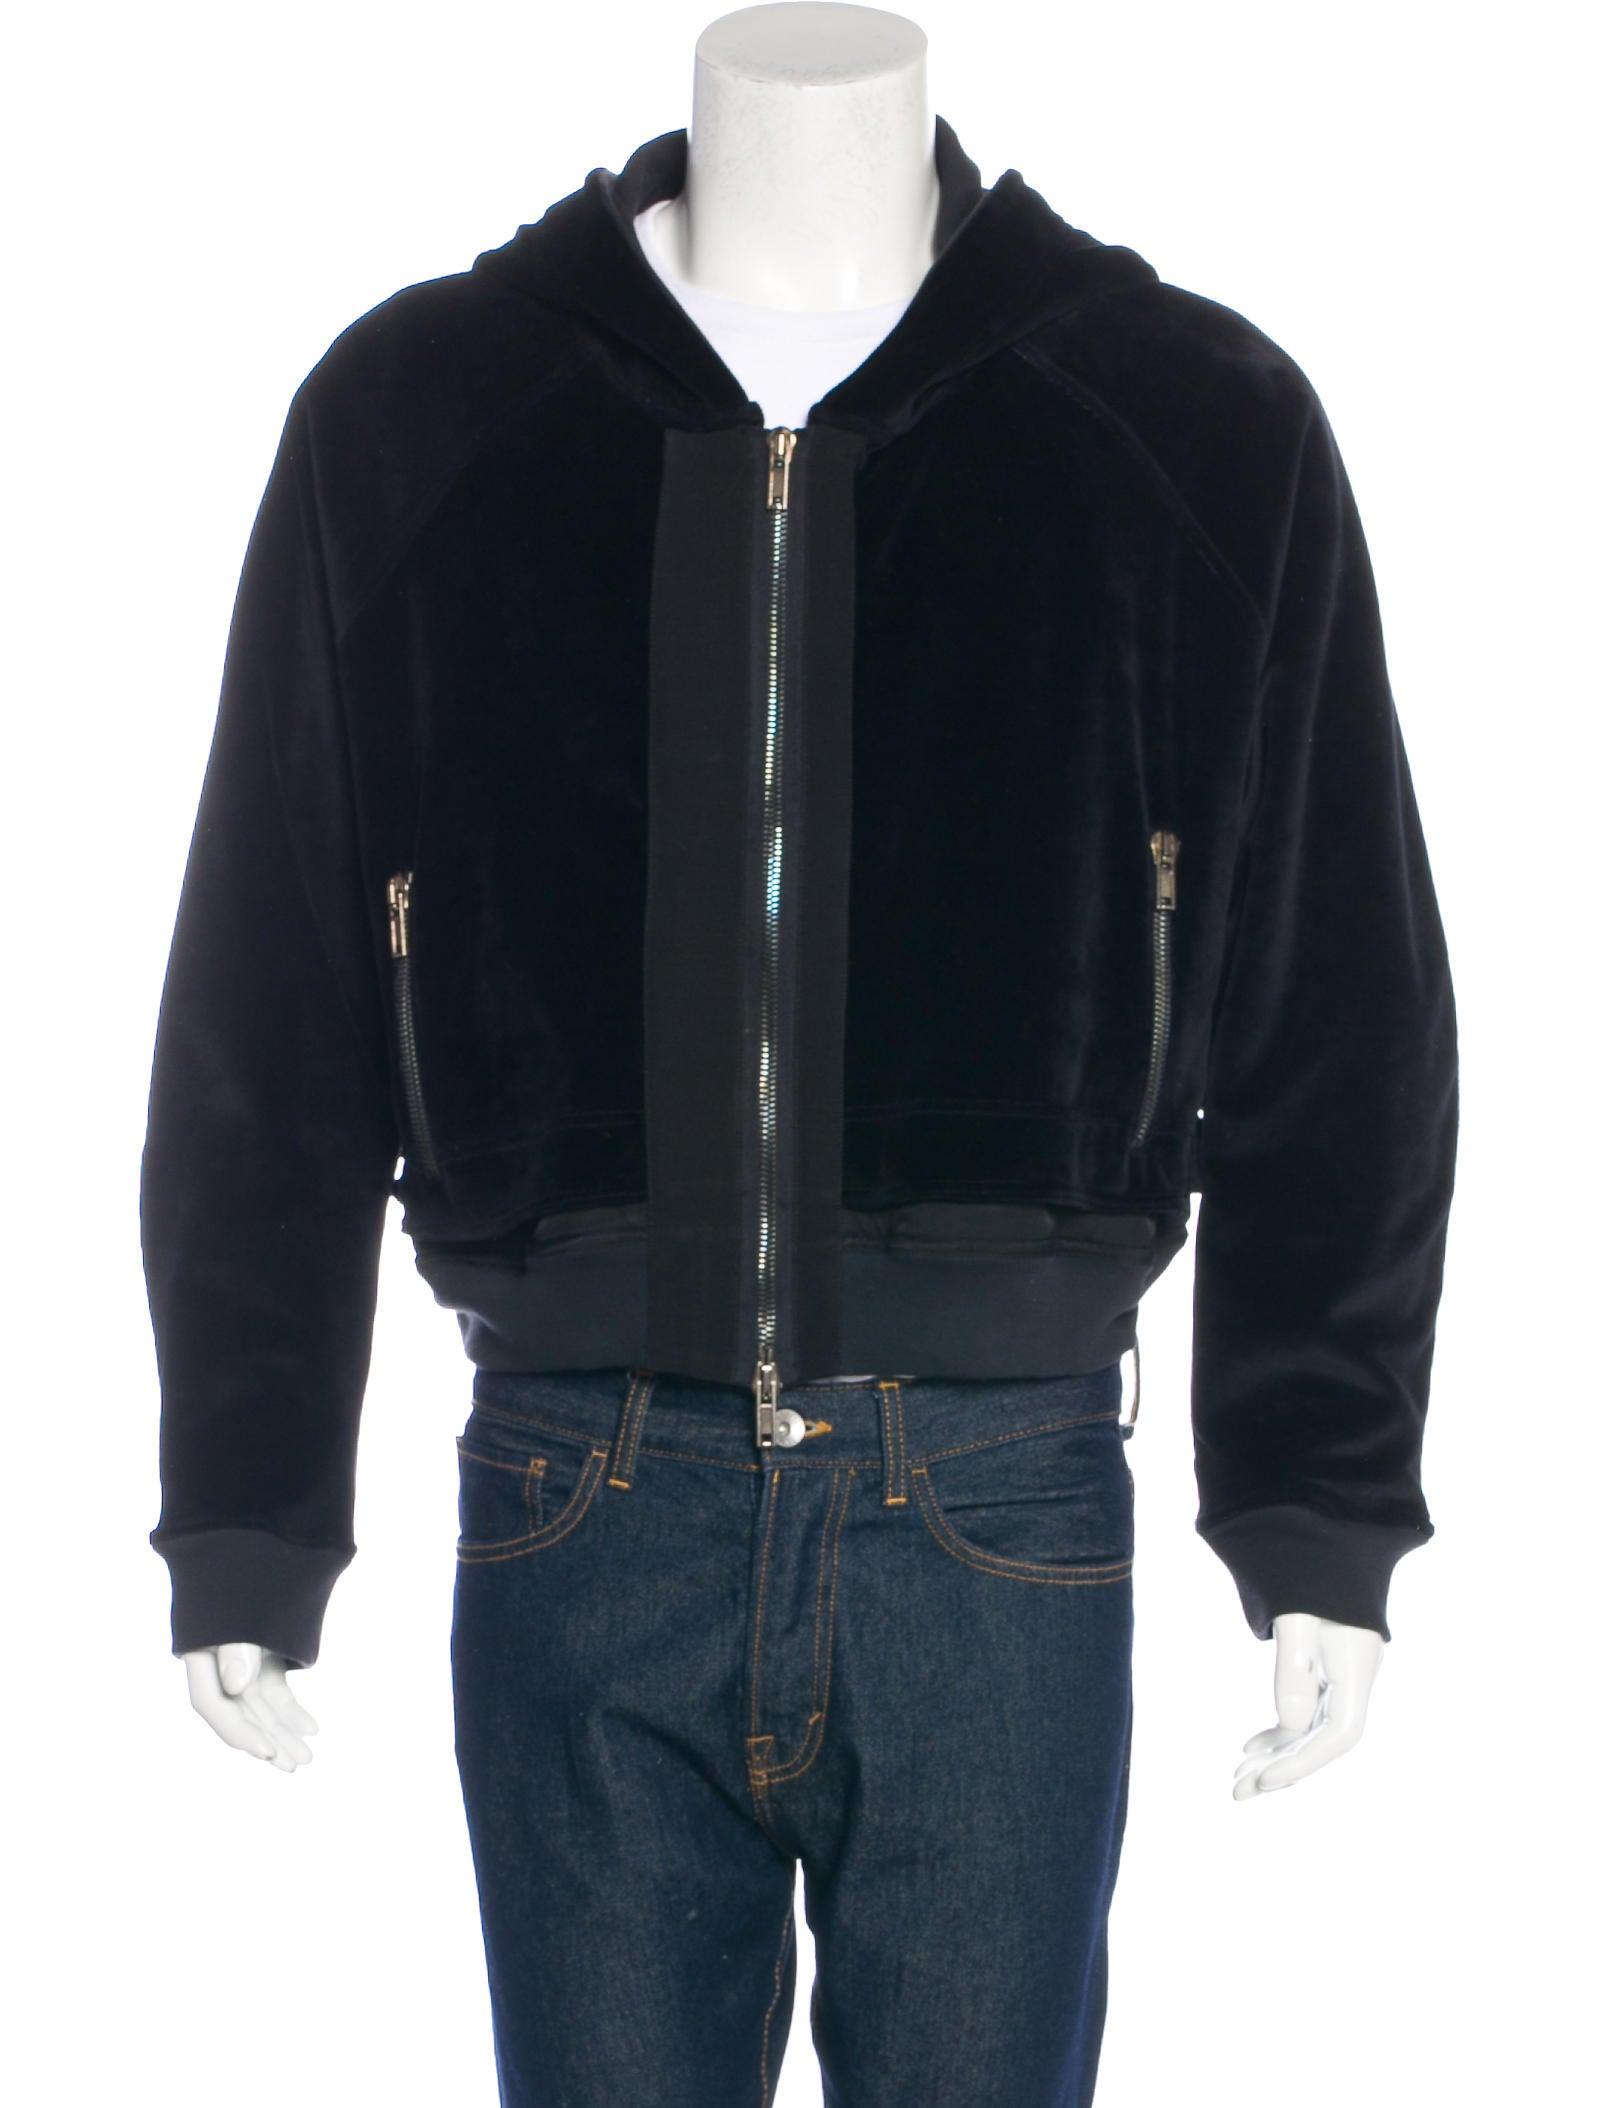 Velour pants and hoodie